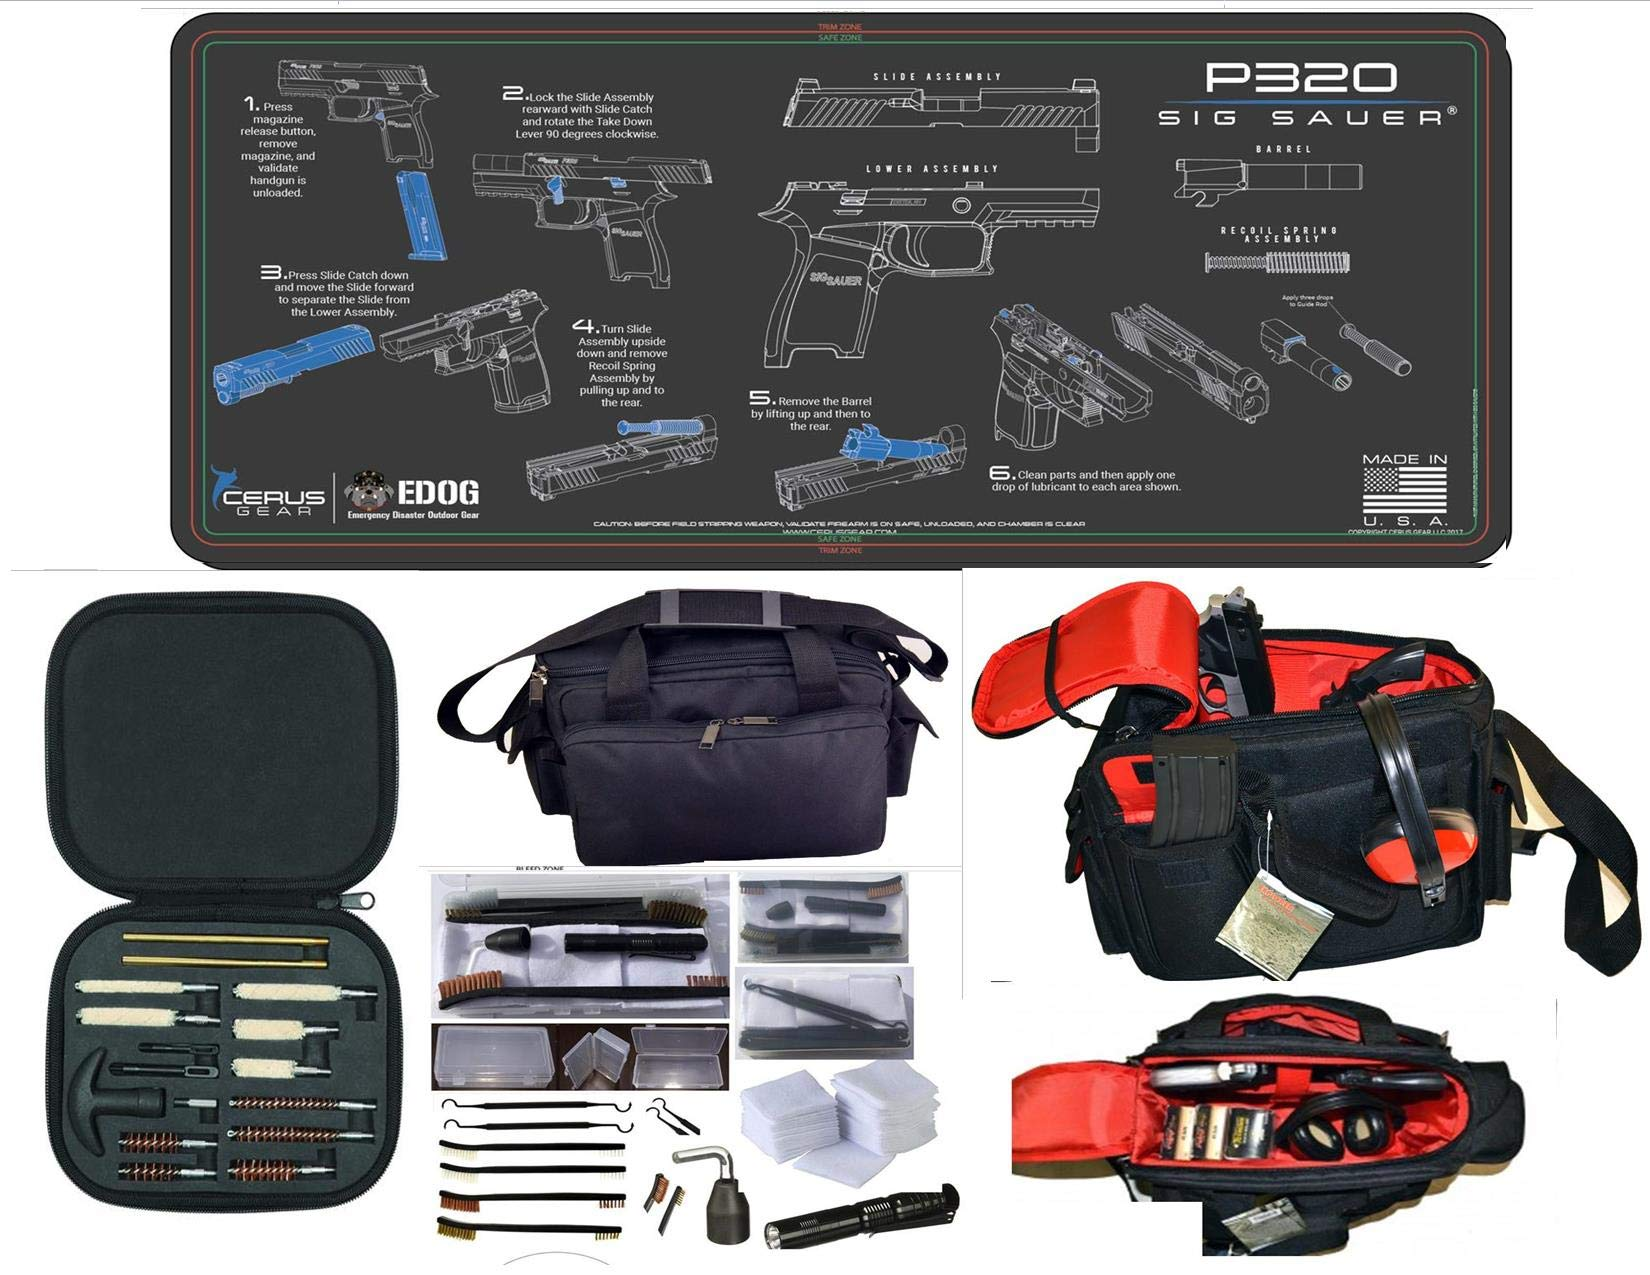 EDOG Sig Sauer P320 Cerus Instuctional Step by Step Gun Cleaning Mat & Black Hard Stone Hot Shot High Vis Handgun Pistol Range Duty Bag & 27 Pc Hand Gun Range/Field Cleaning Kit by EDOG (Image #1)